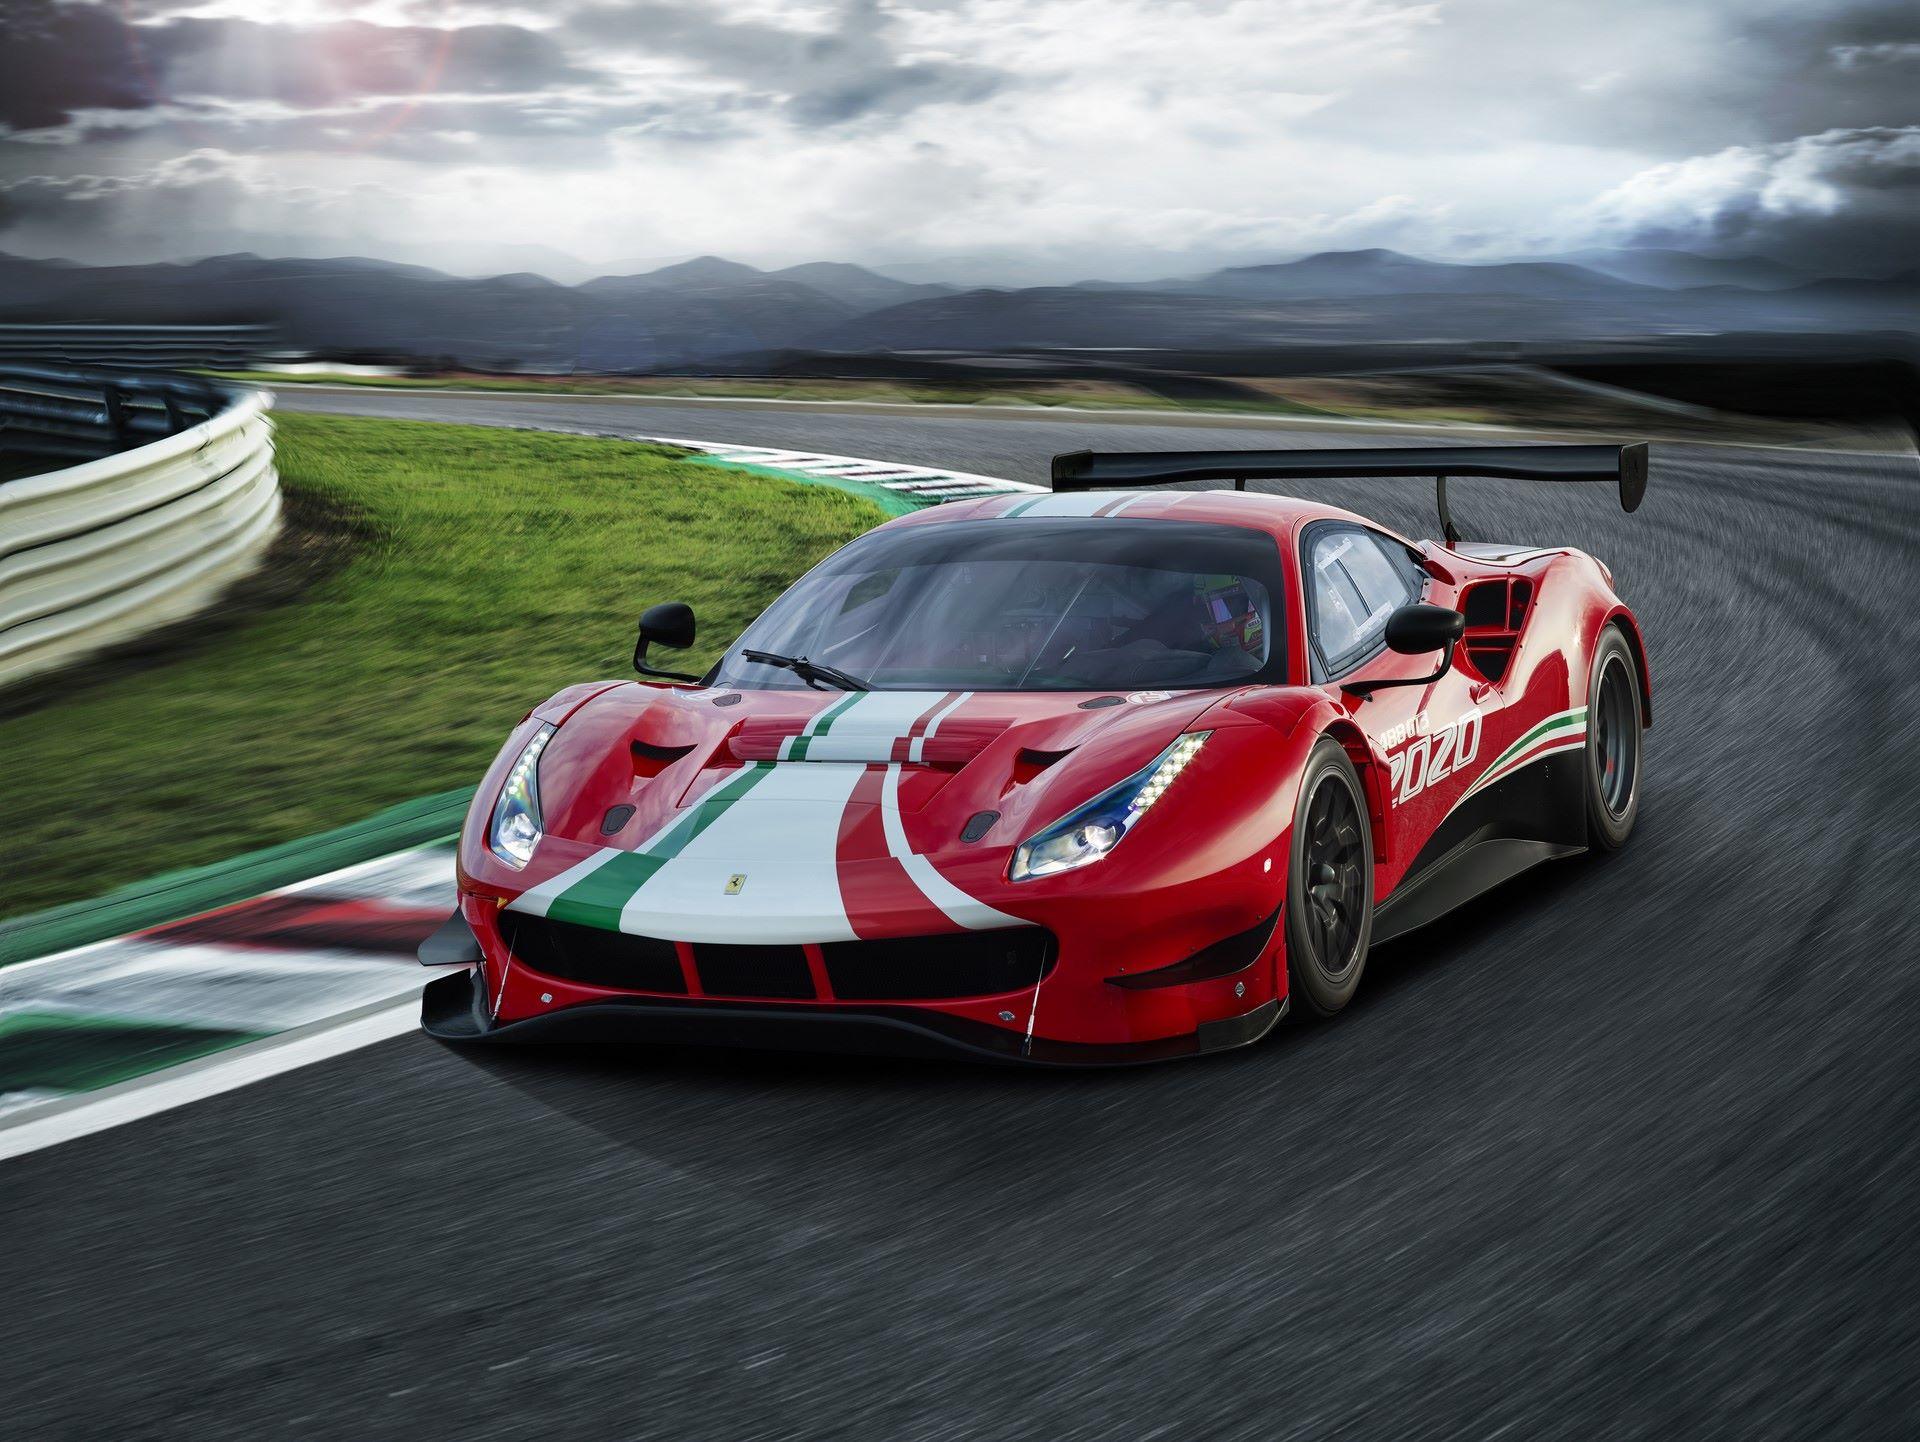 Ferrari-488-GT3-Evο-2020-6